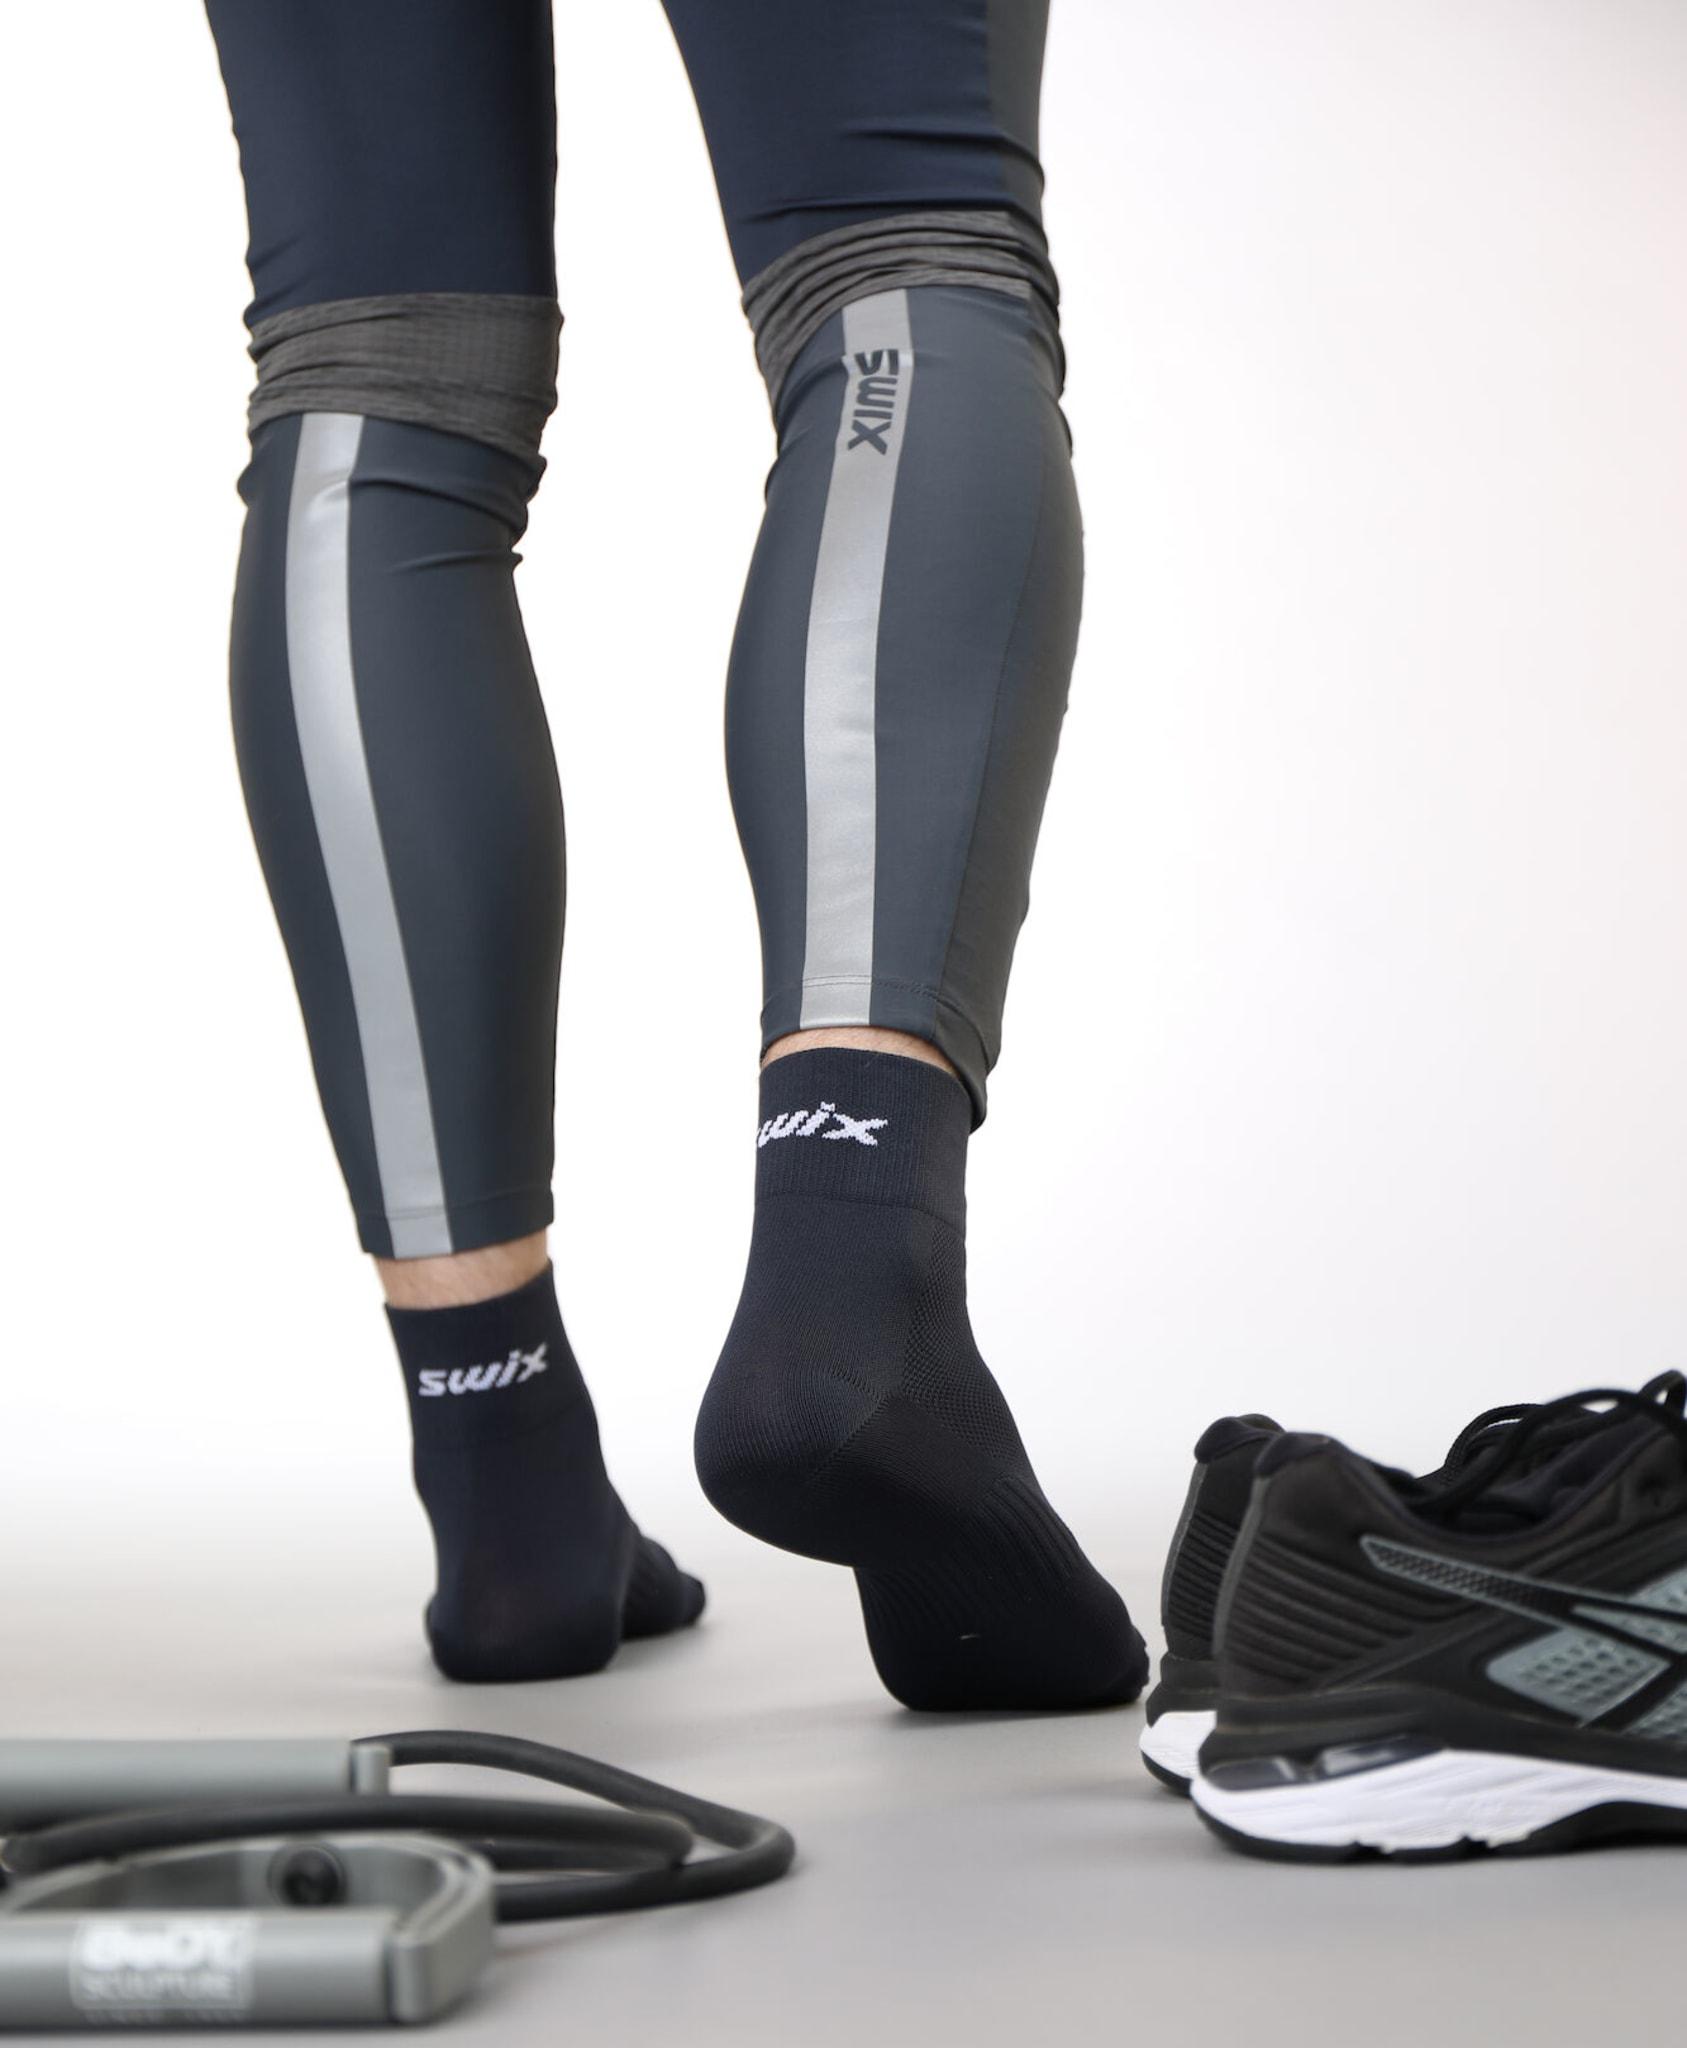 2-pakning med tekniske hydrofobiske sokker godt egnet for våte løpeforhold og andre forhold/aktiviteter